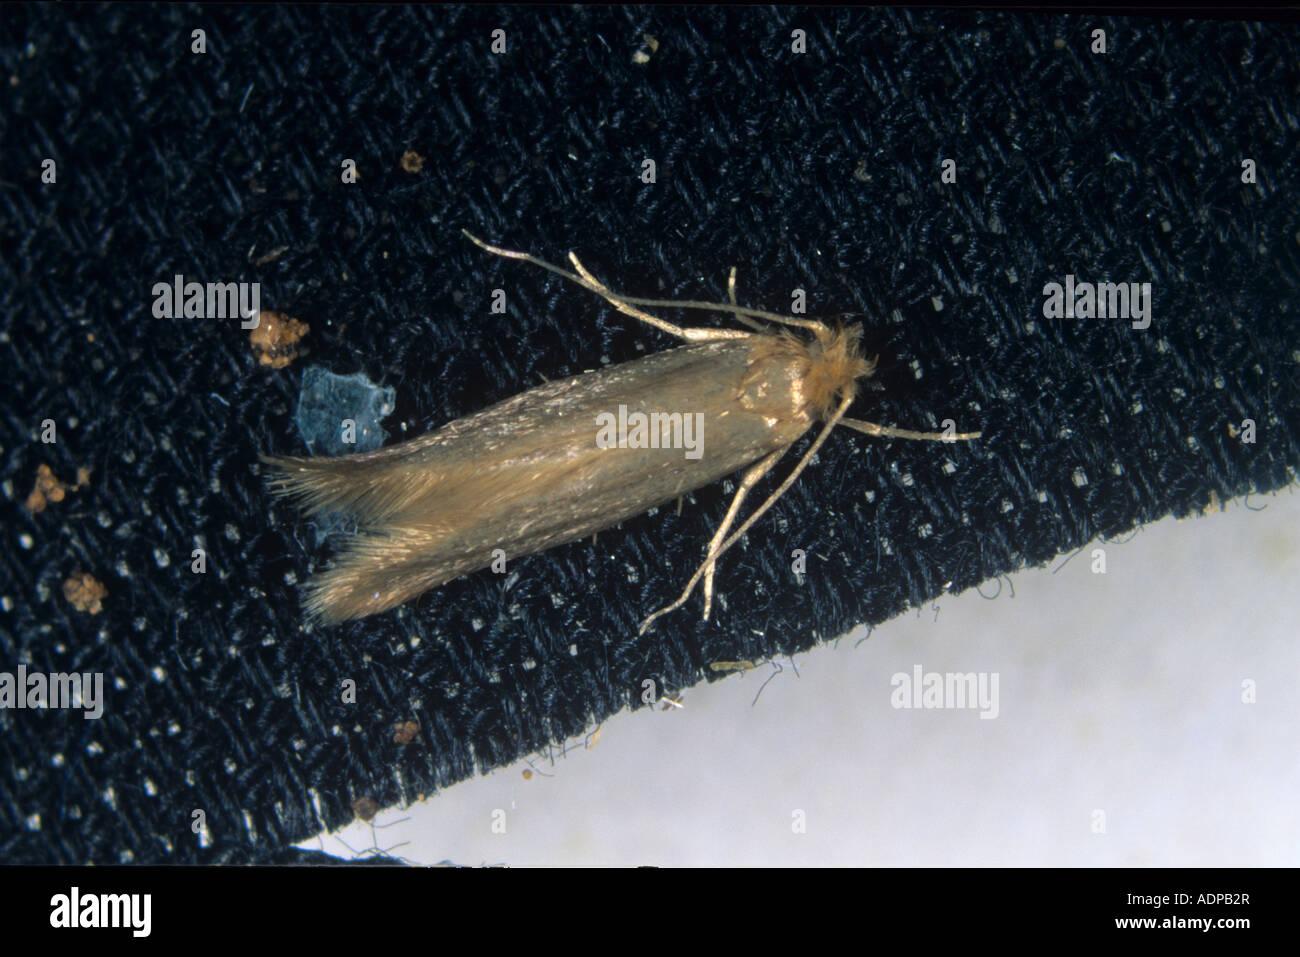 Clothes moth Tineola biselliella moth on fabric - Stock Image